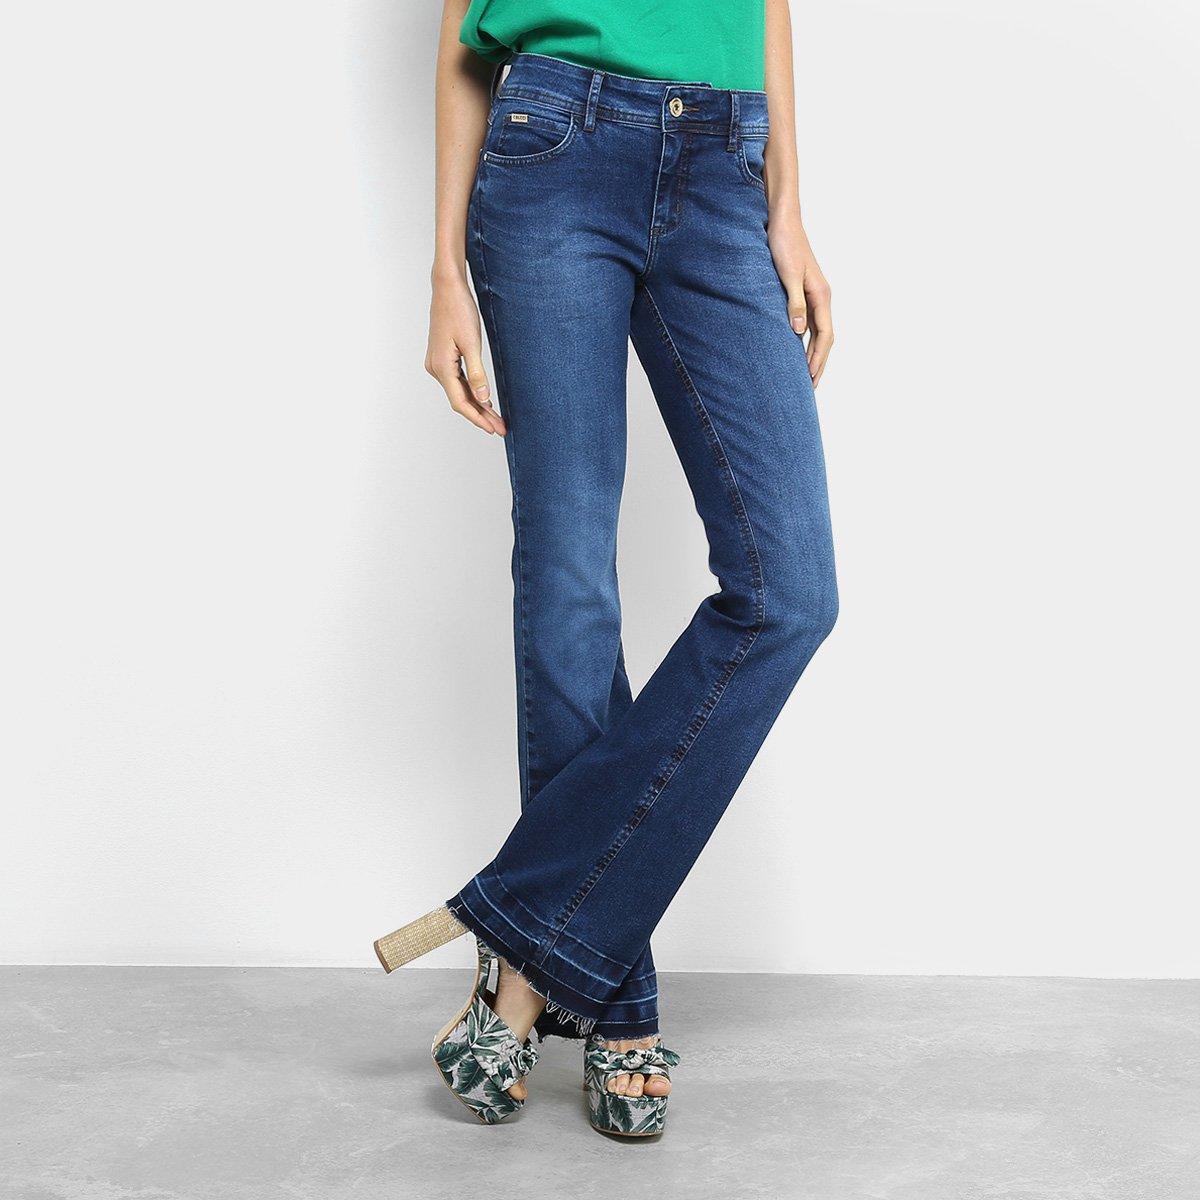 Calça Jeans Flare Colcci Estonada Barra Desfiada Cintura Média Feminina eea1f5439e5